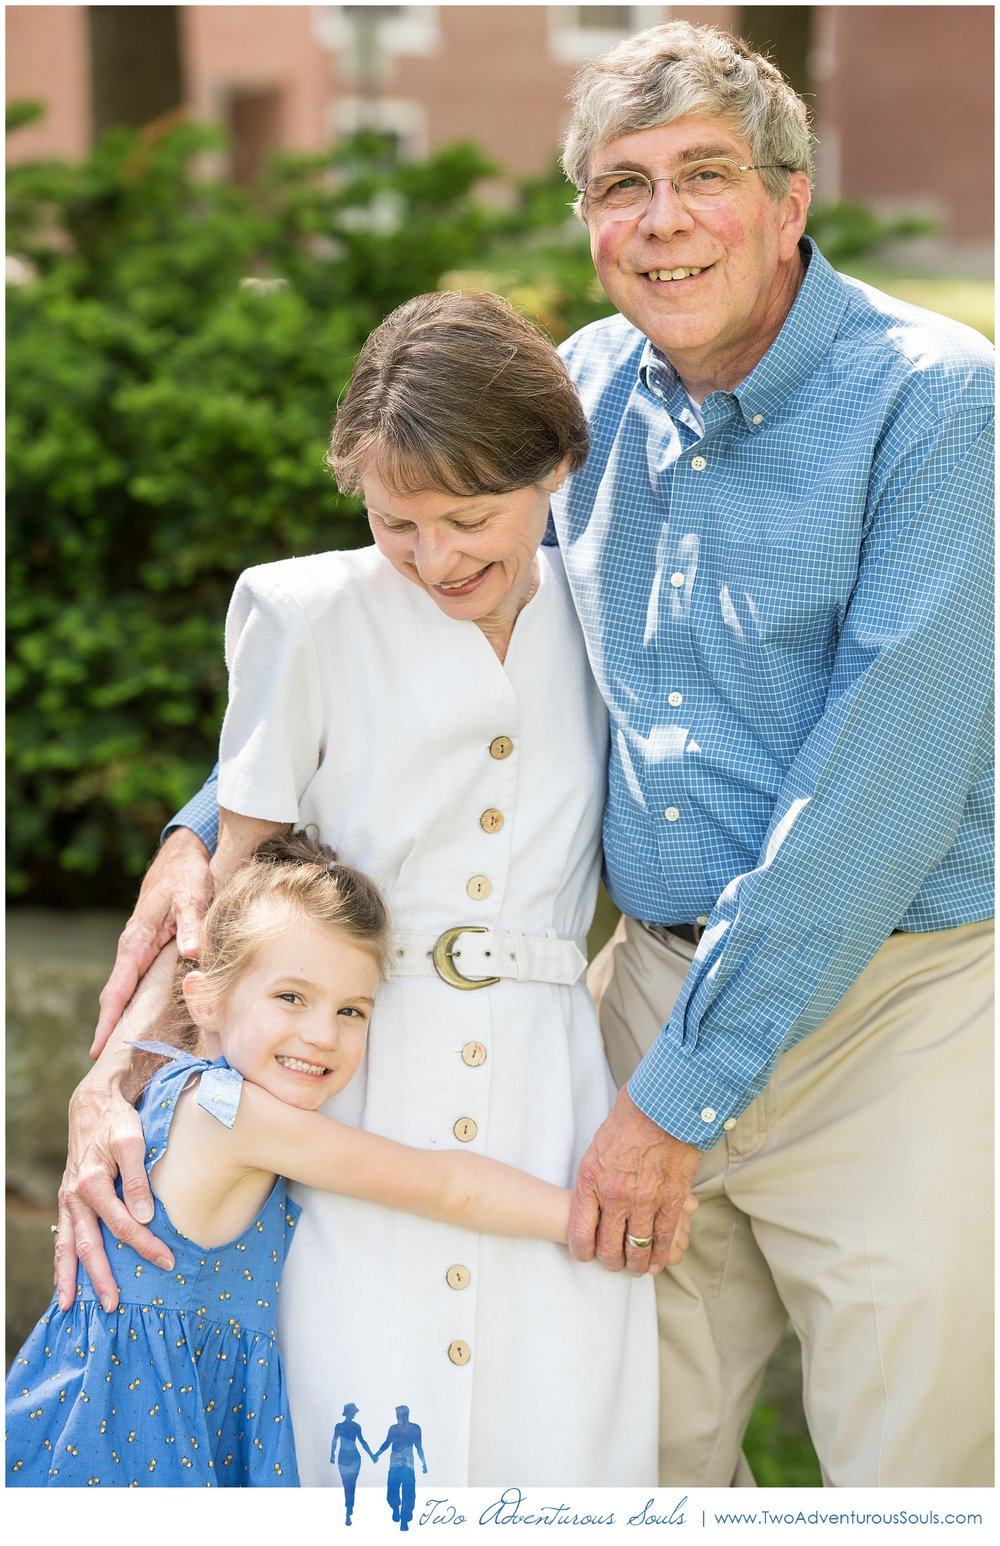 061218 - J Family Portraits-71 - Maine Family Photographers, Two Adventurous Souls.jpg